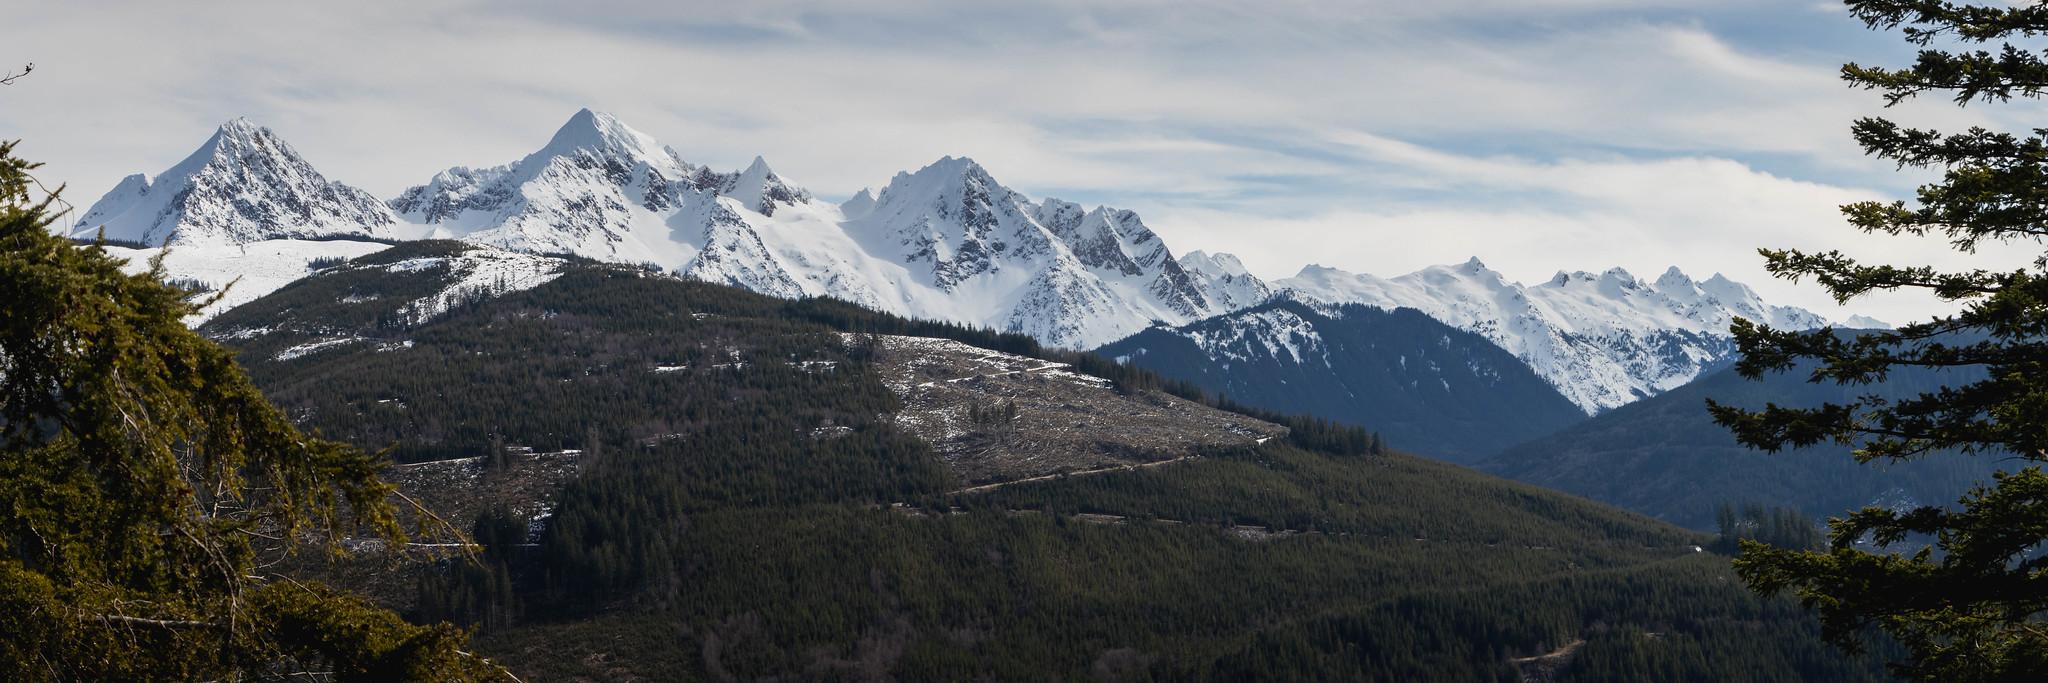 Twin Sisters Mountain panoramic view